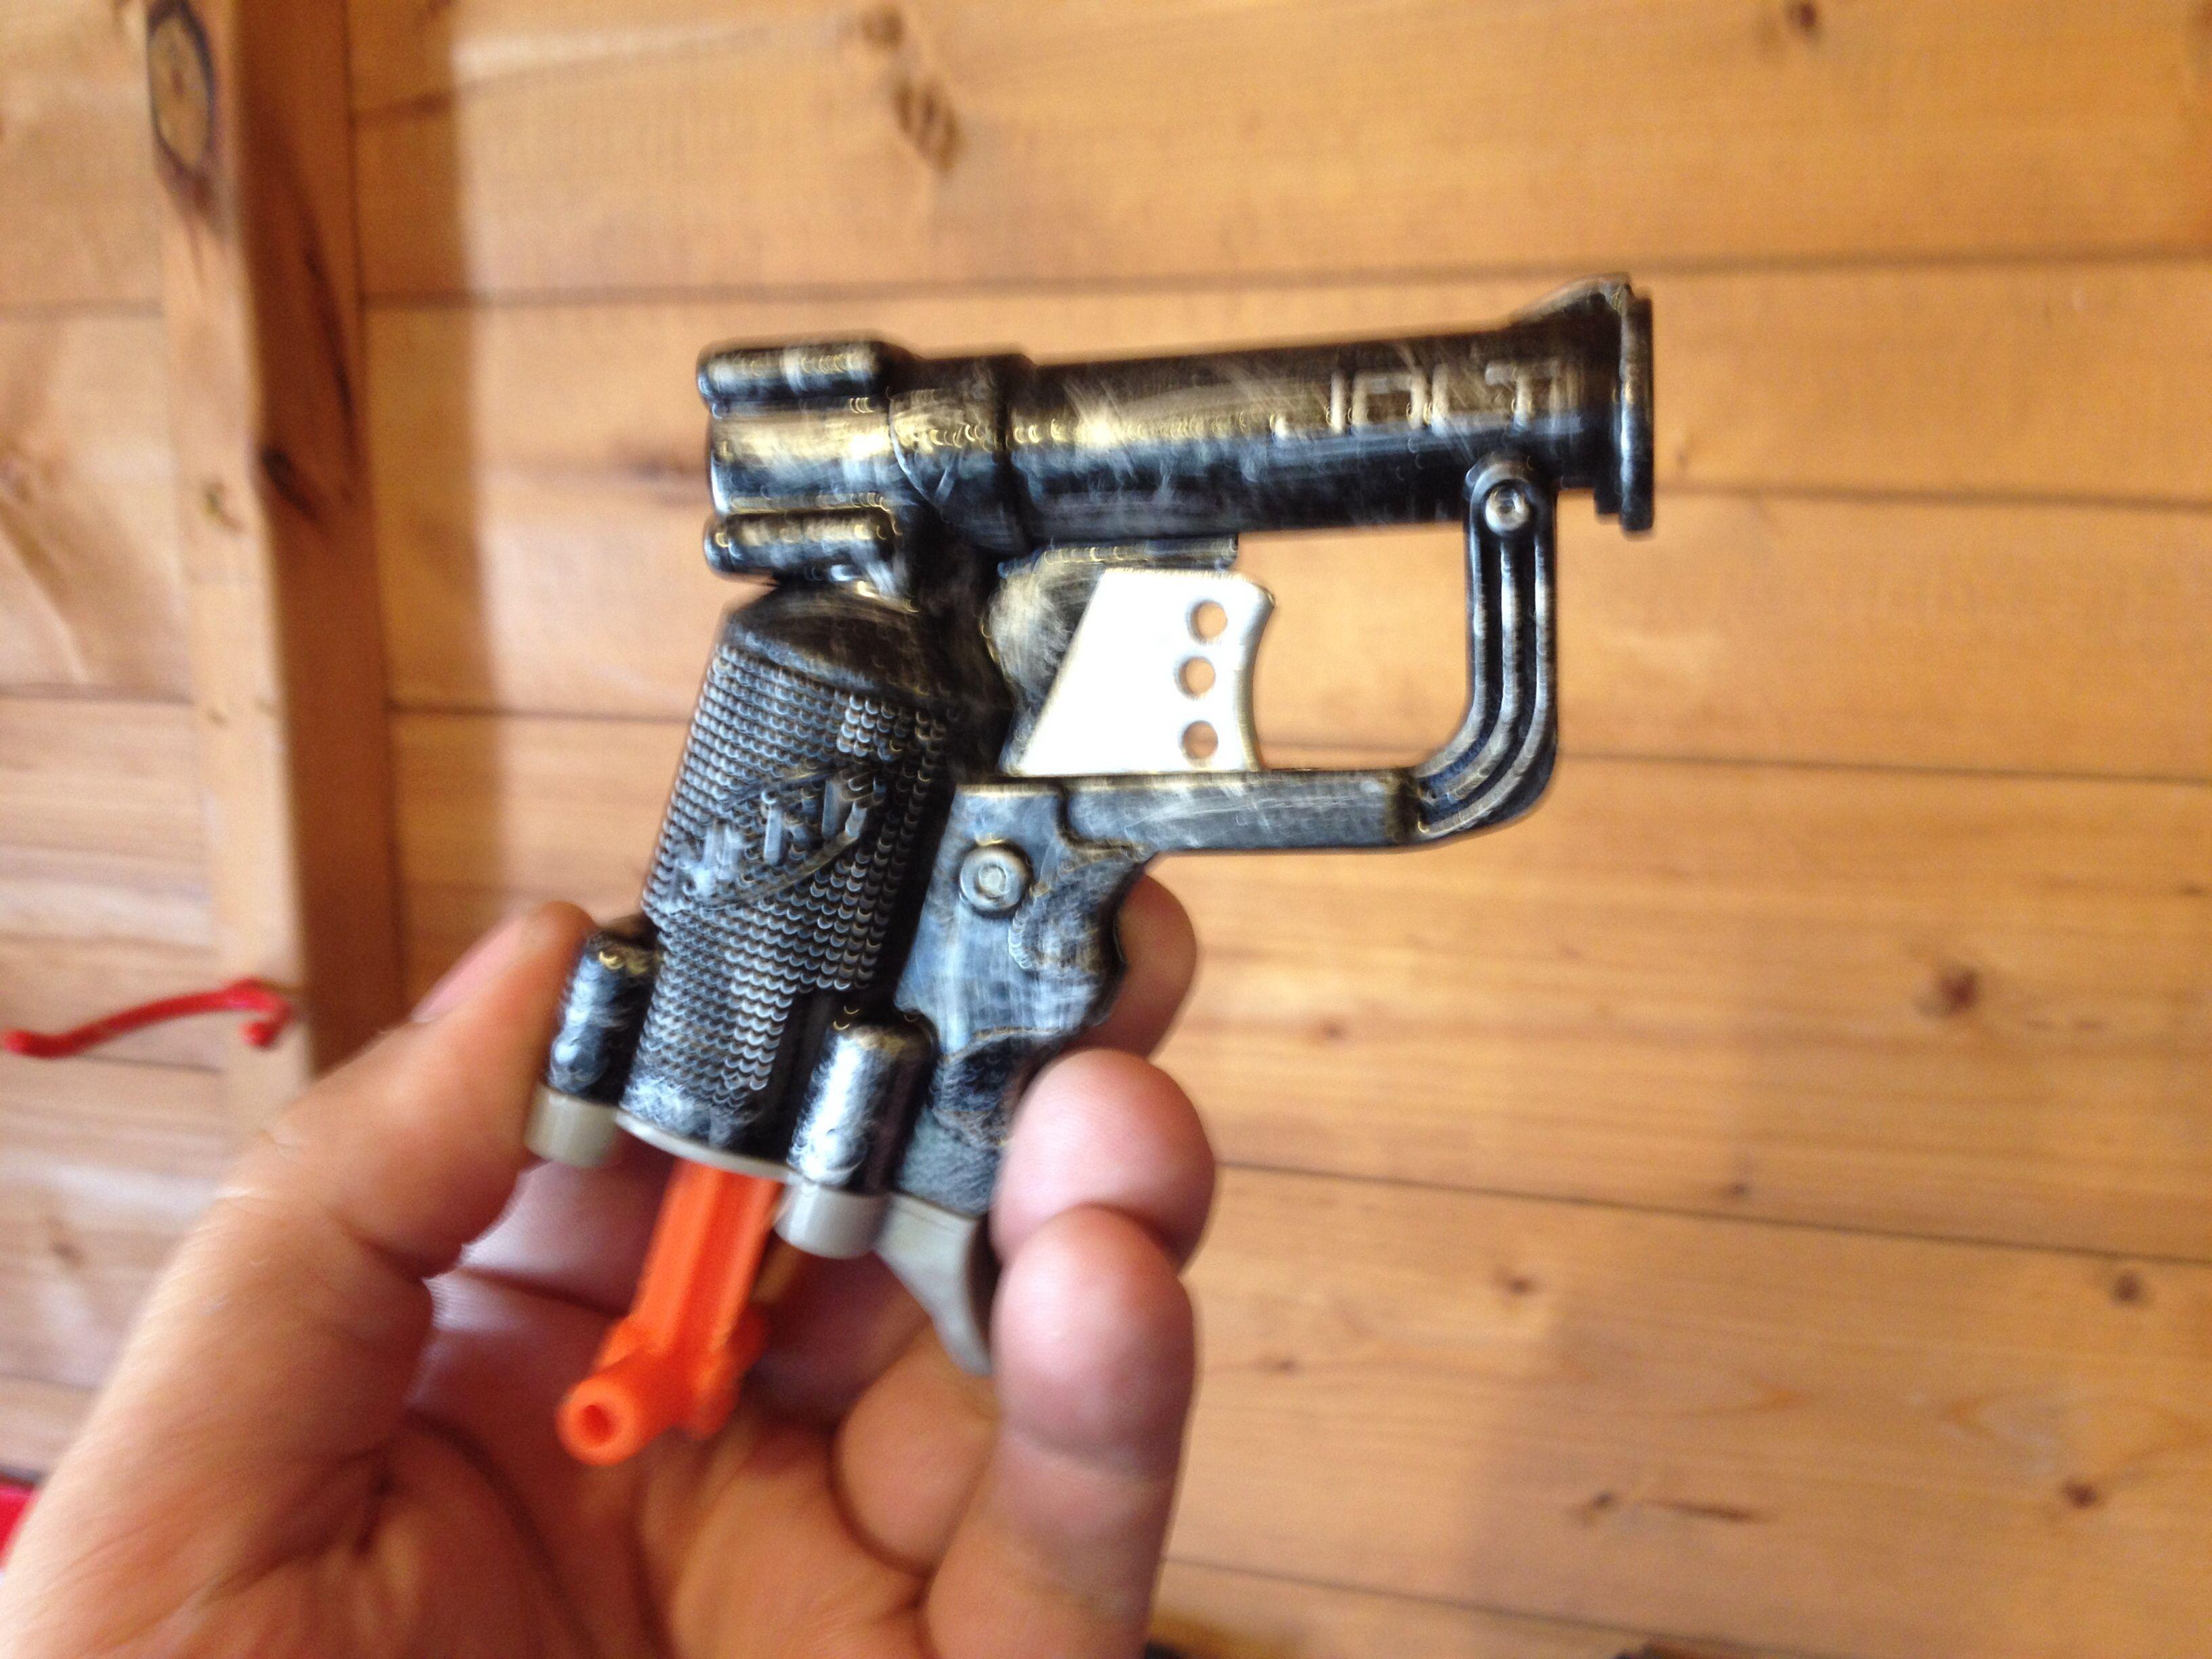 Nerf N-Strike Mega BigShock Blaster - Best Nerf guns for 8-year-